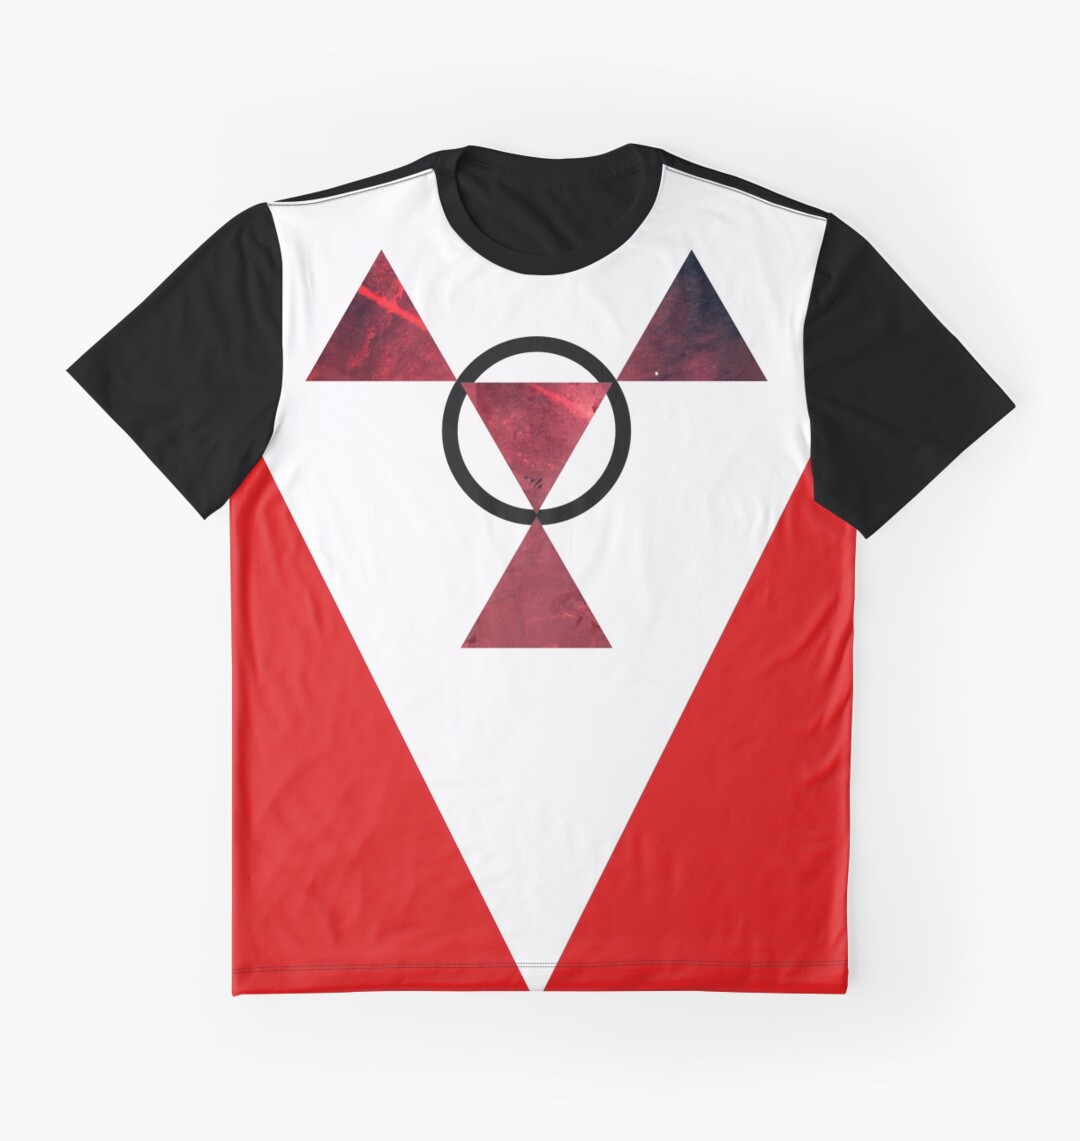 Design shirt redbubble - Digital Hazard